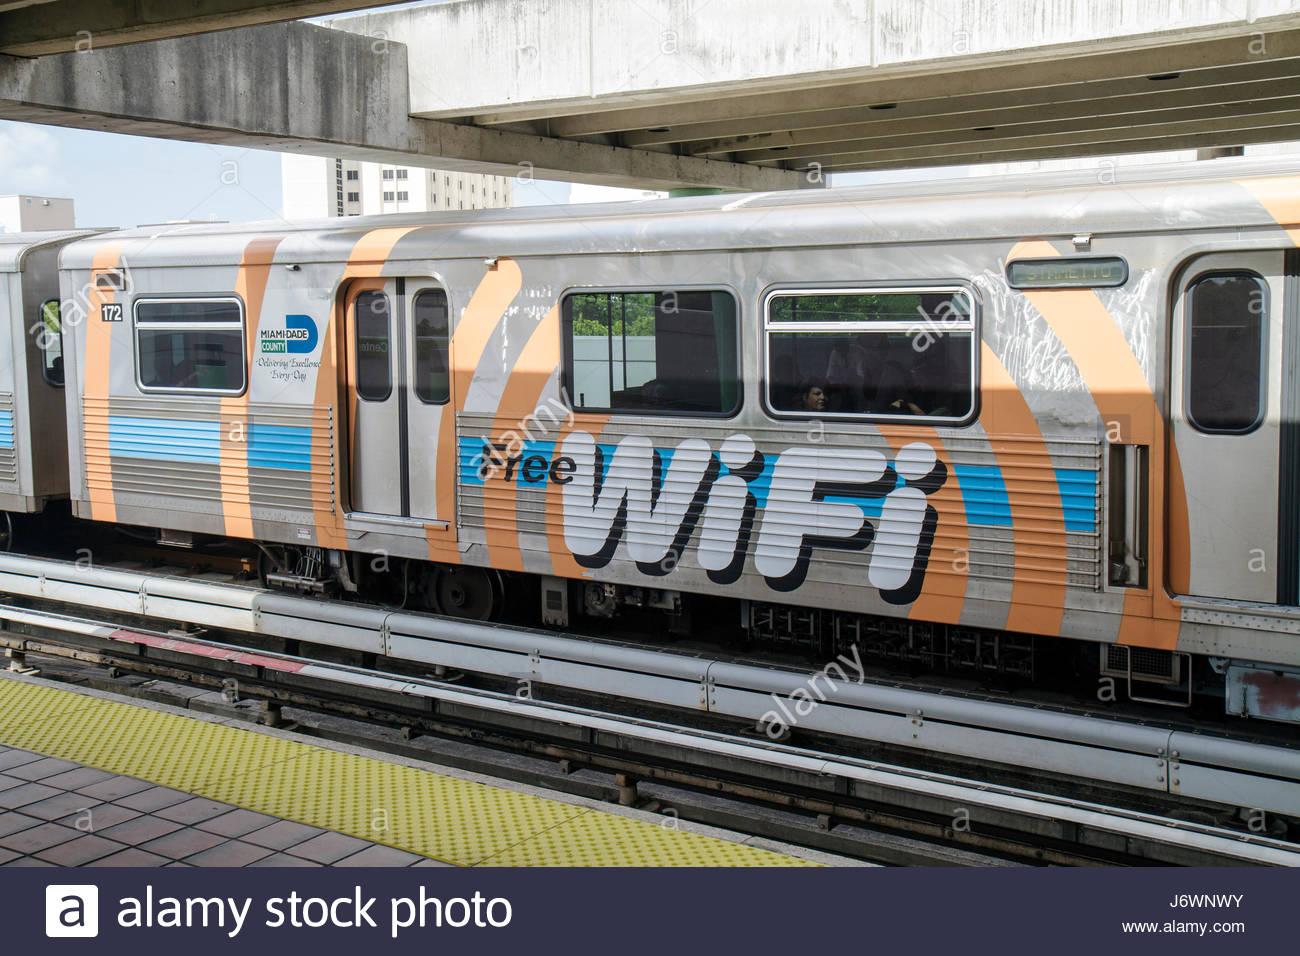 Floride Miami Metrorail Station train accès Internet Wifi gratuit Photo Stock